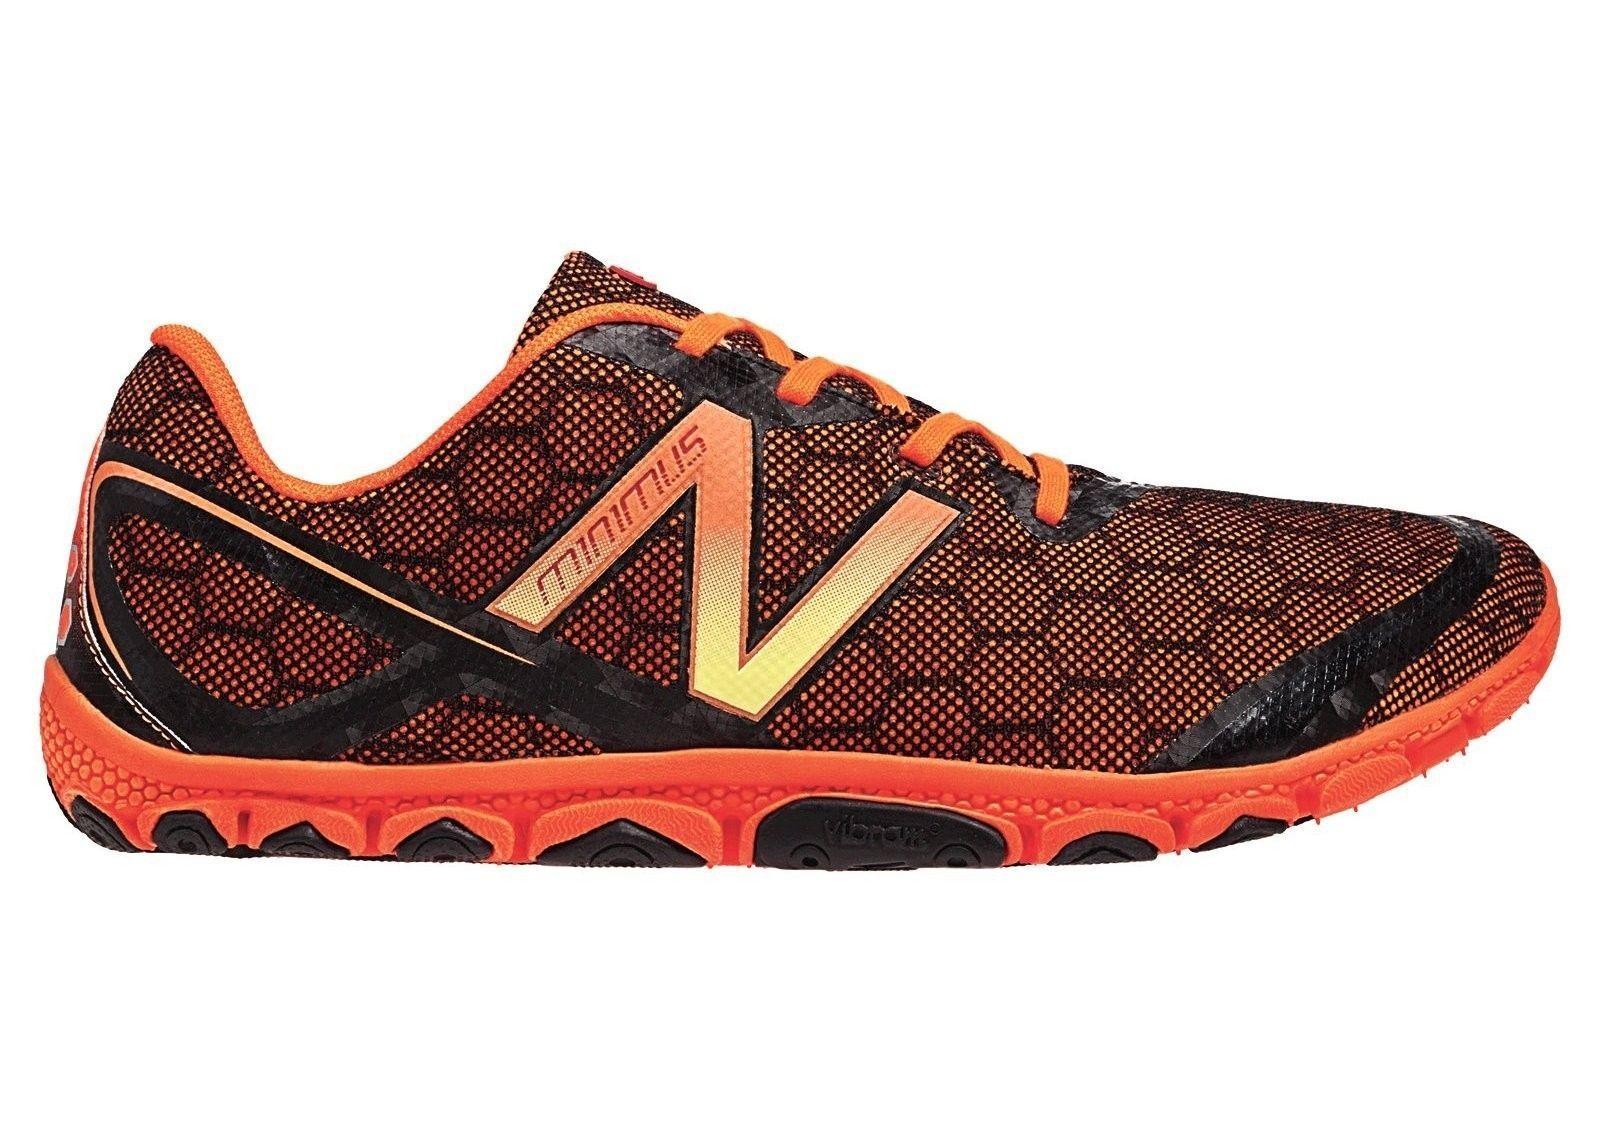 New Balance Minimus MR10 BO2 MR10BO2 Running shoes Men's - Black and orange